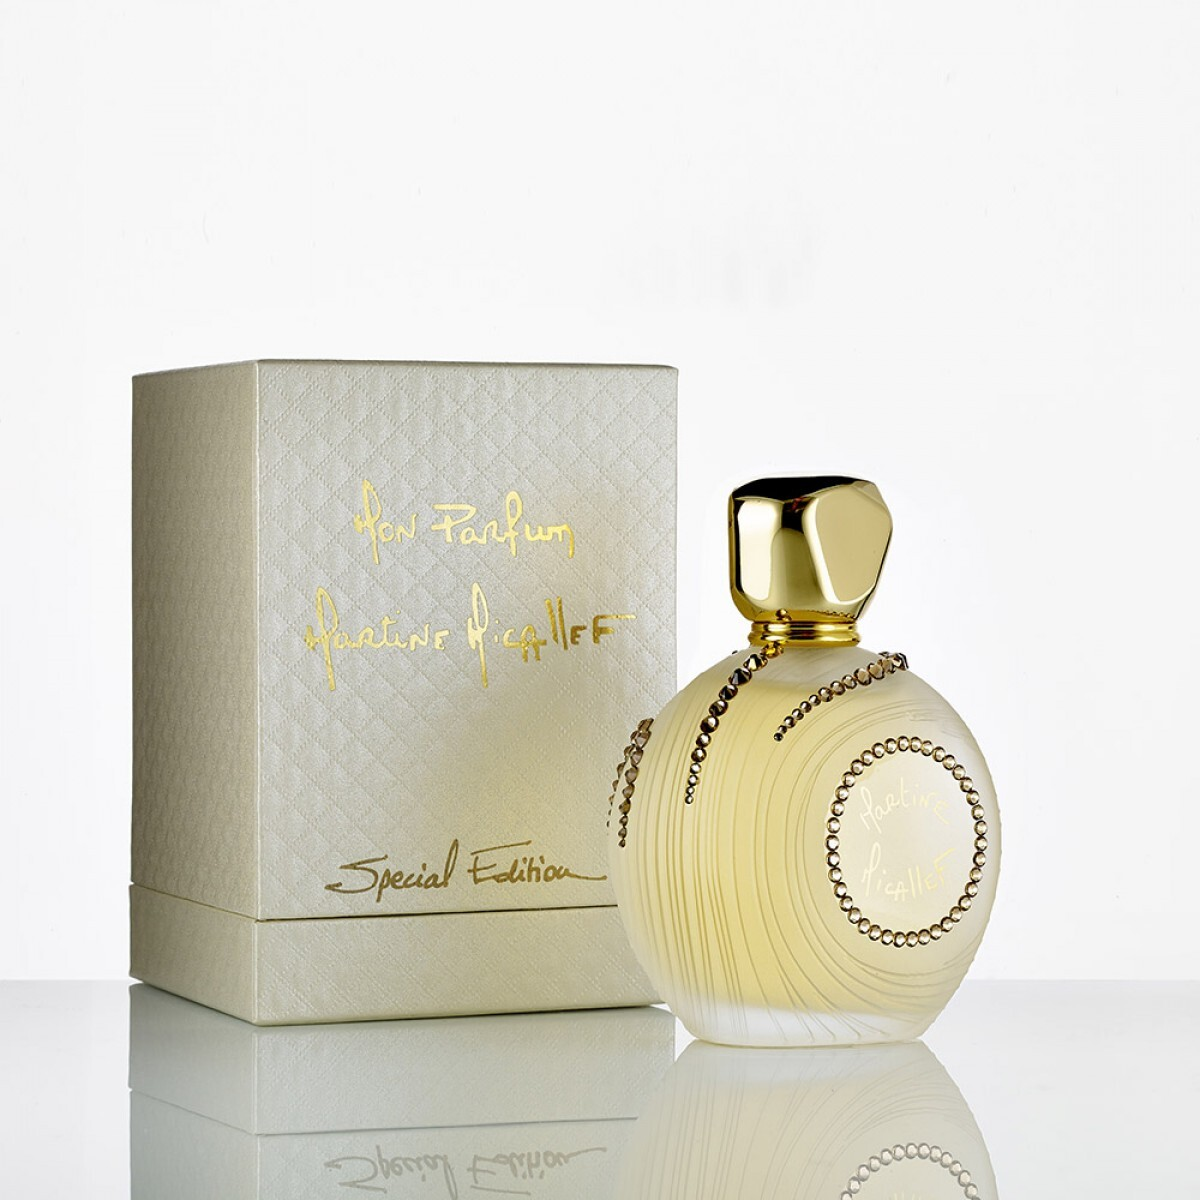 Парфюмерная вода (спец издание) 100 мл M.Micallef Mon Parfum